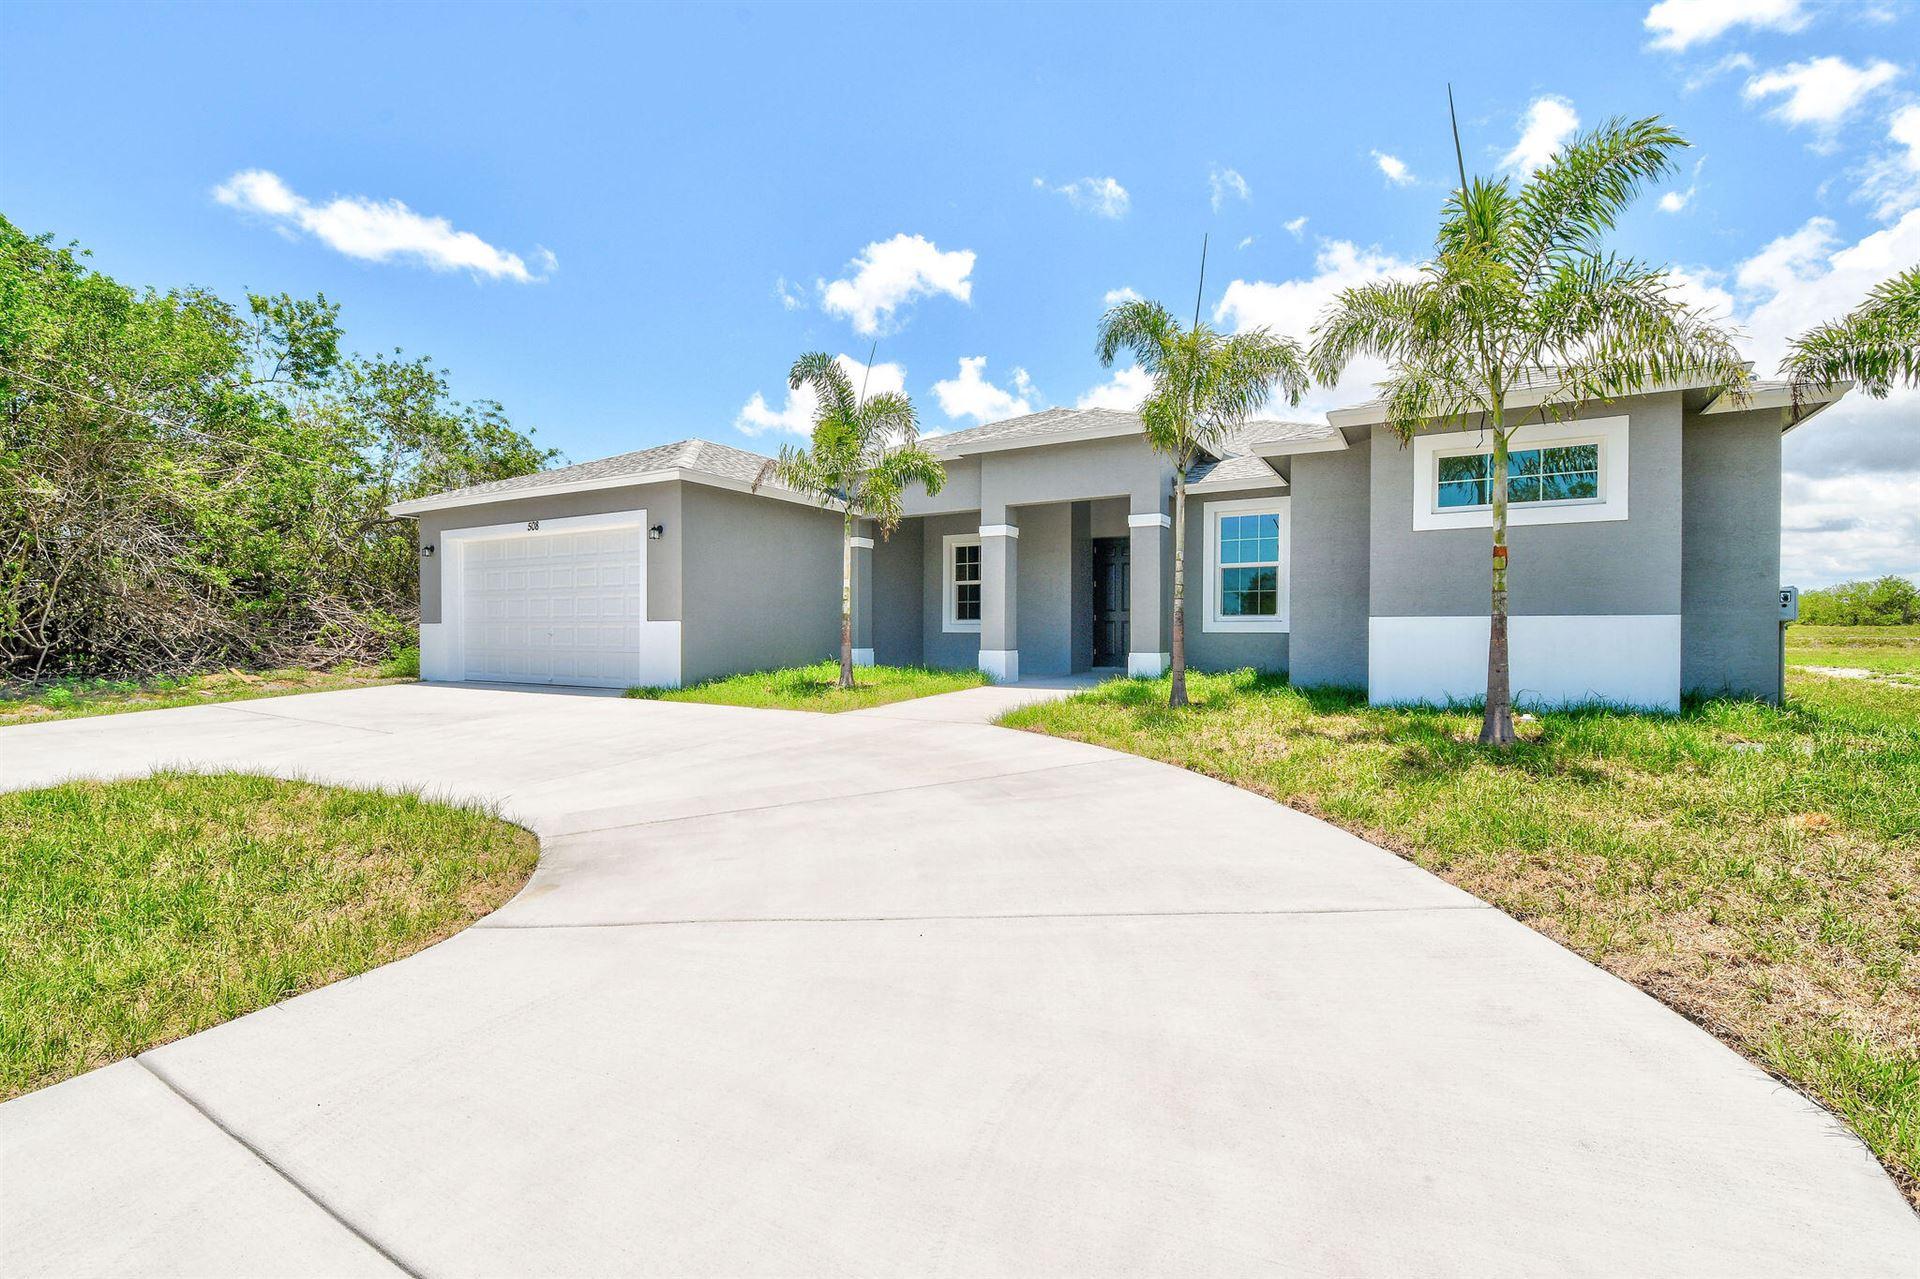 Photo of 508 SW Bradshaw Circle, Port Saint Lucie, FL 34953 (MLS # RX-10753384)